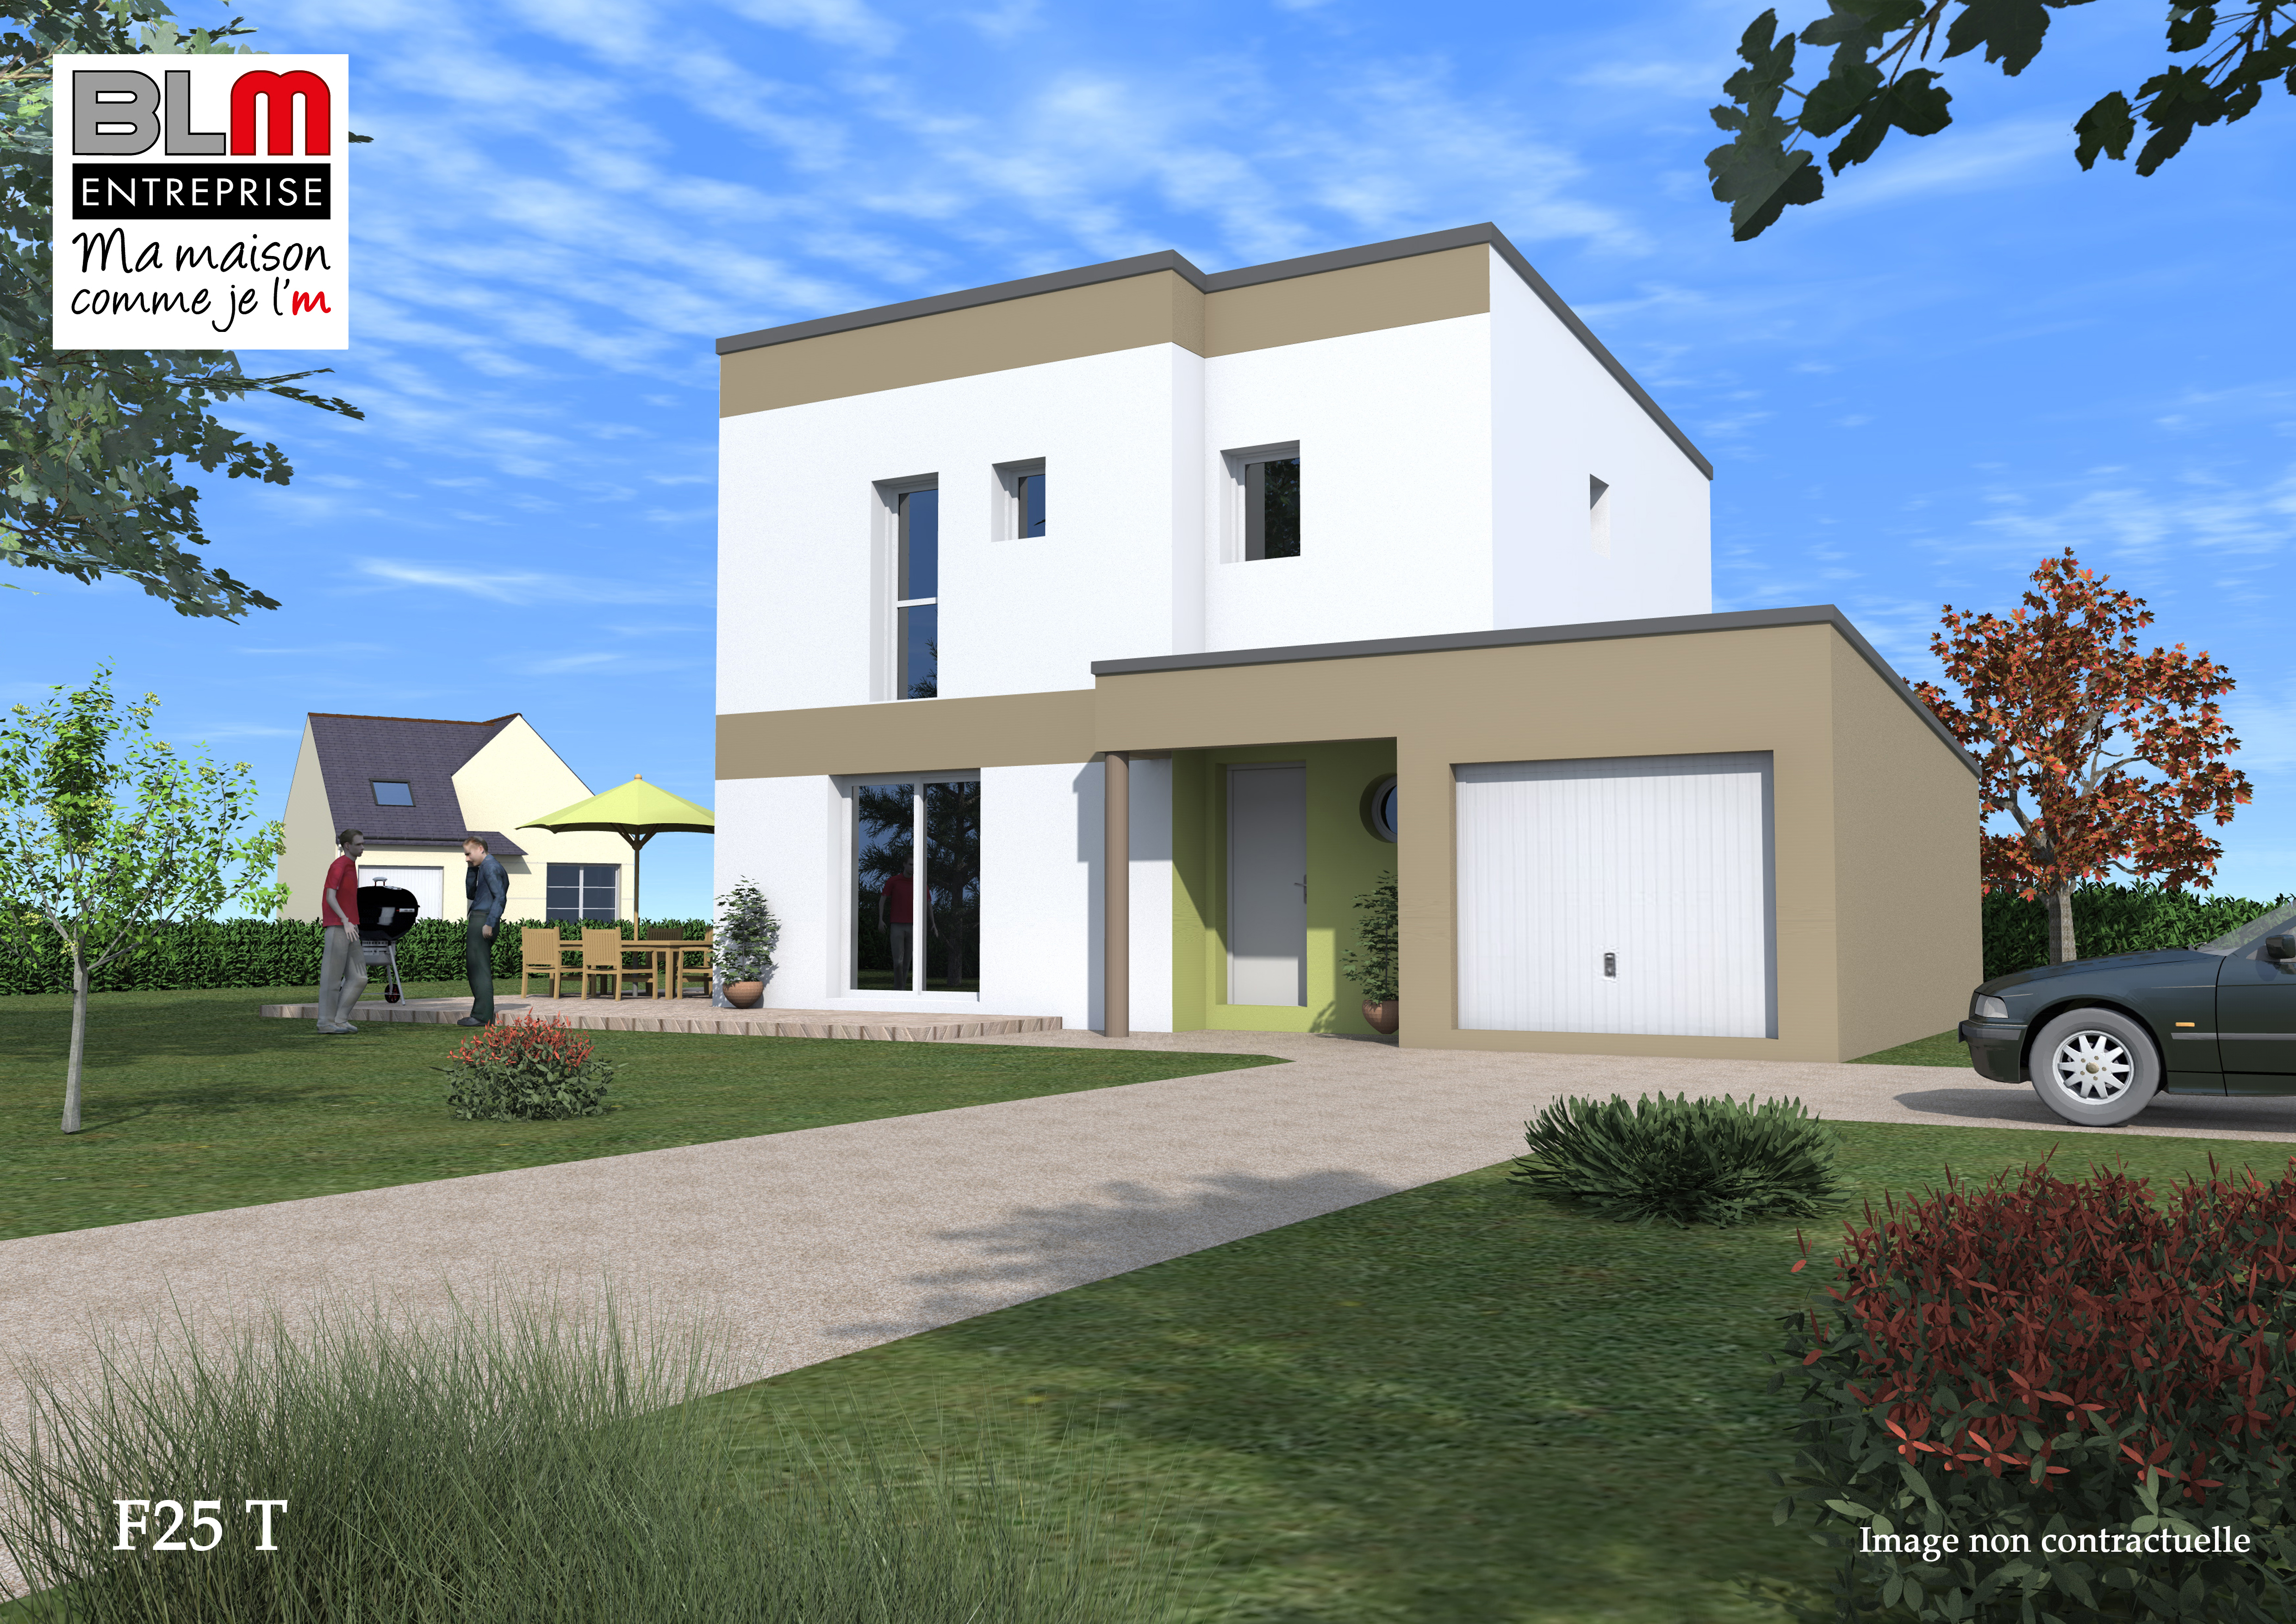 constructeur maison montauban de bretagne ventana blog. Black Bedroom Furniture Sets. Home Design Ideas